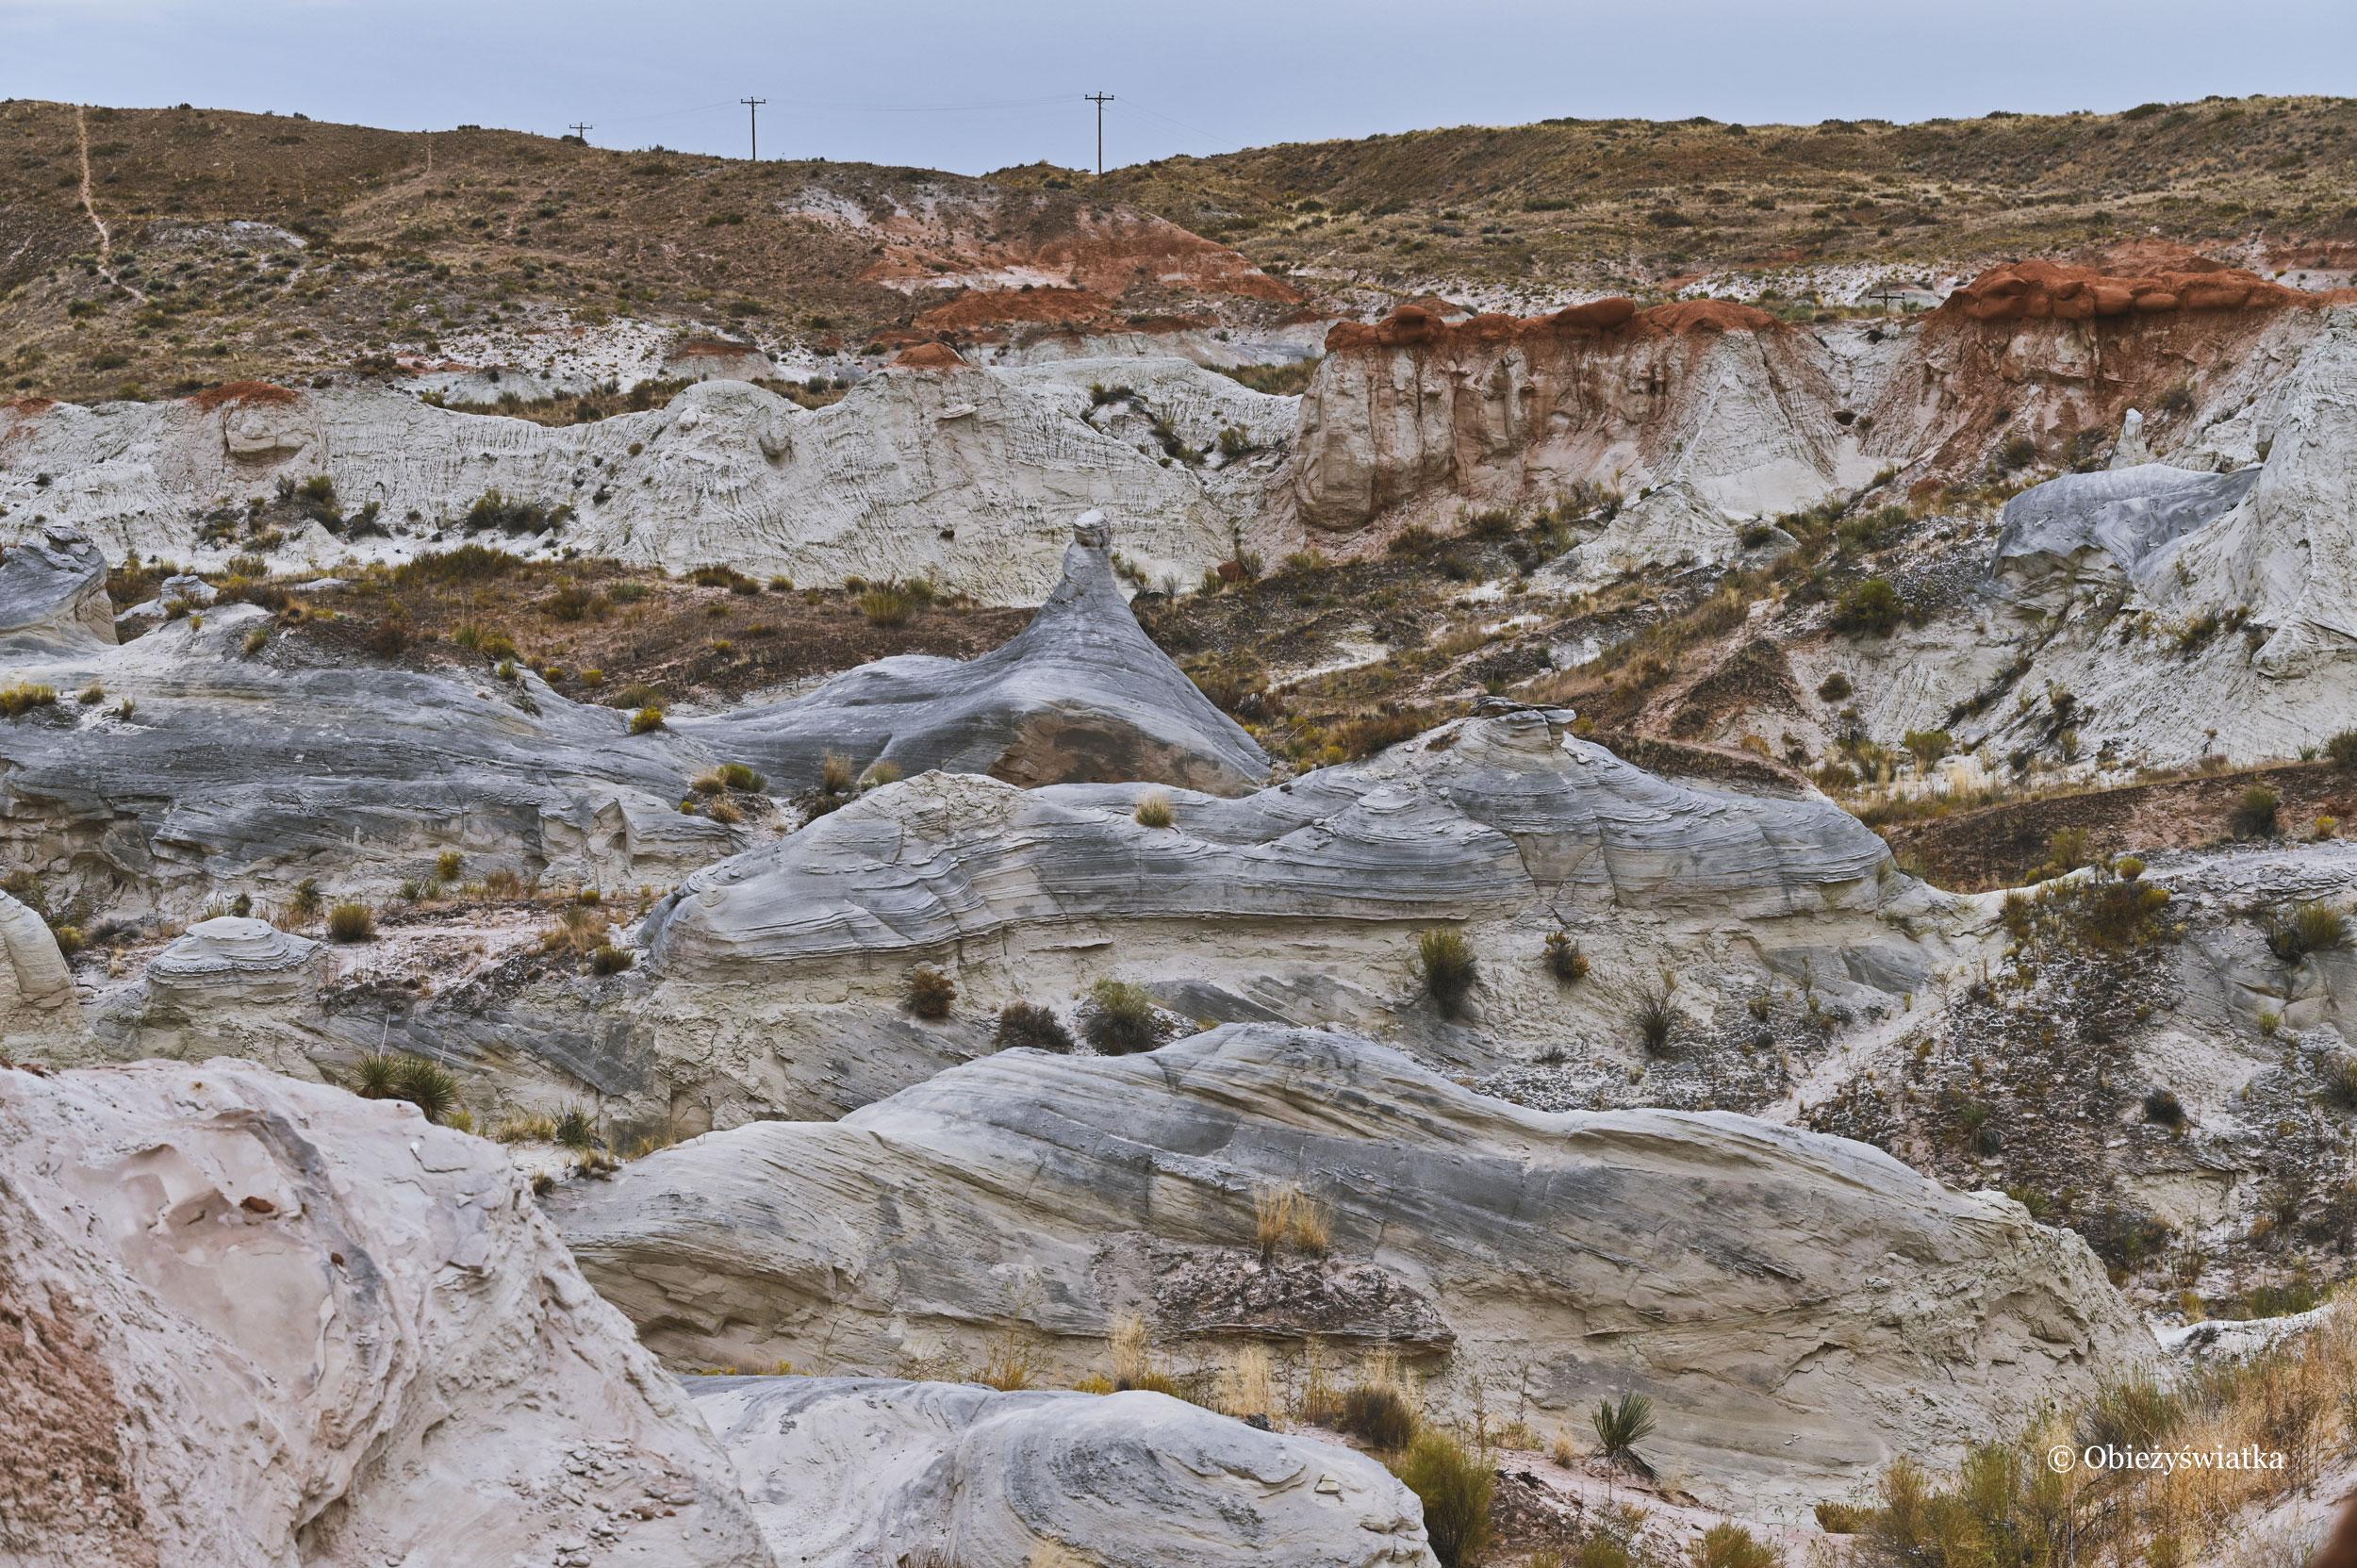 Kolorowo, Hoodoos, Toadstools Trail, Utah